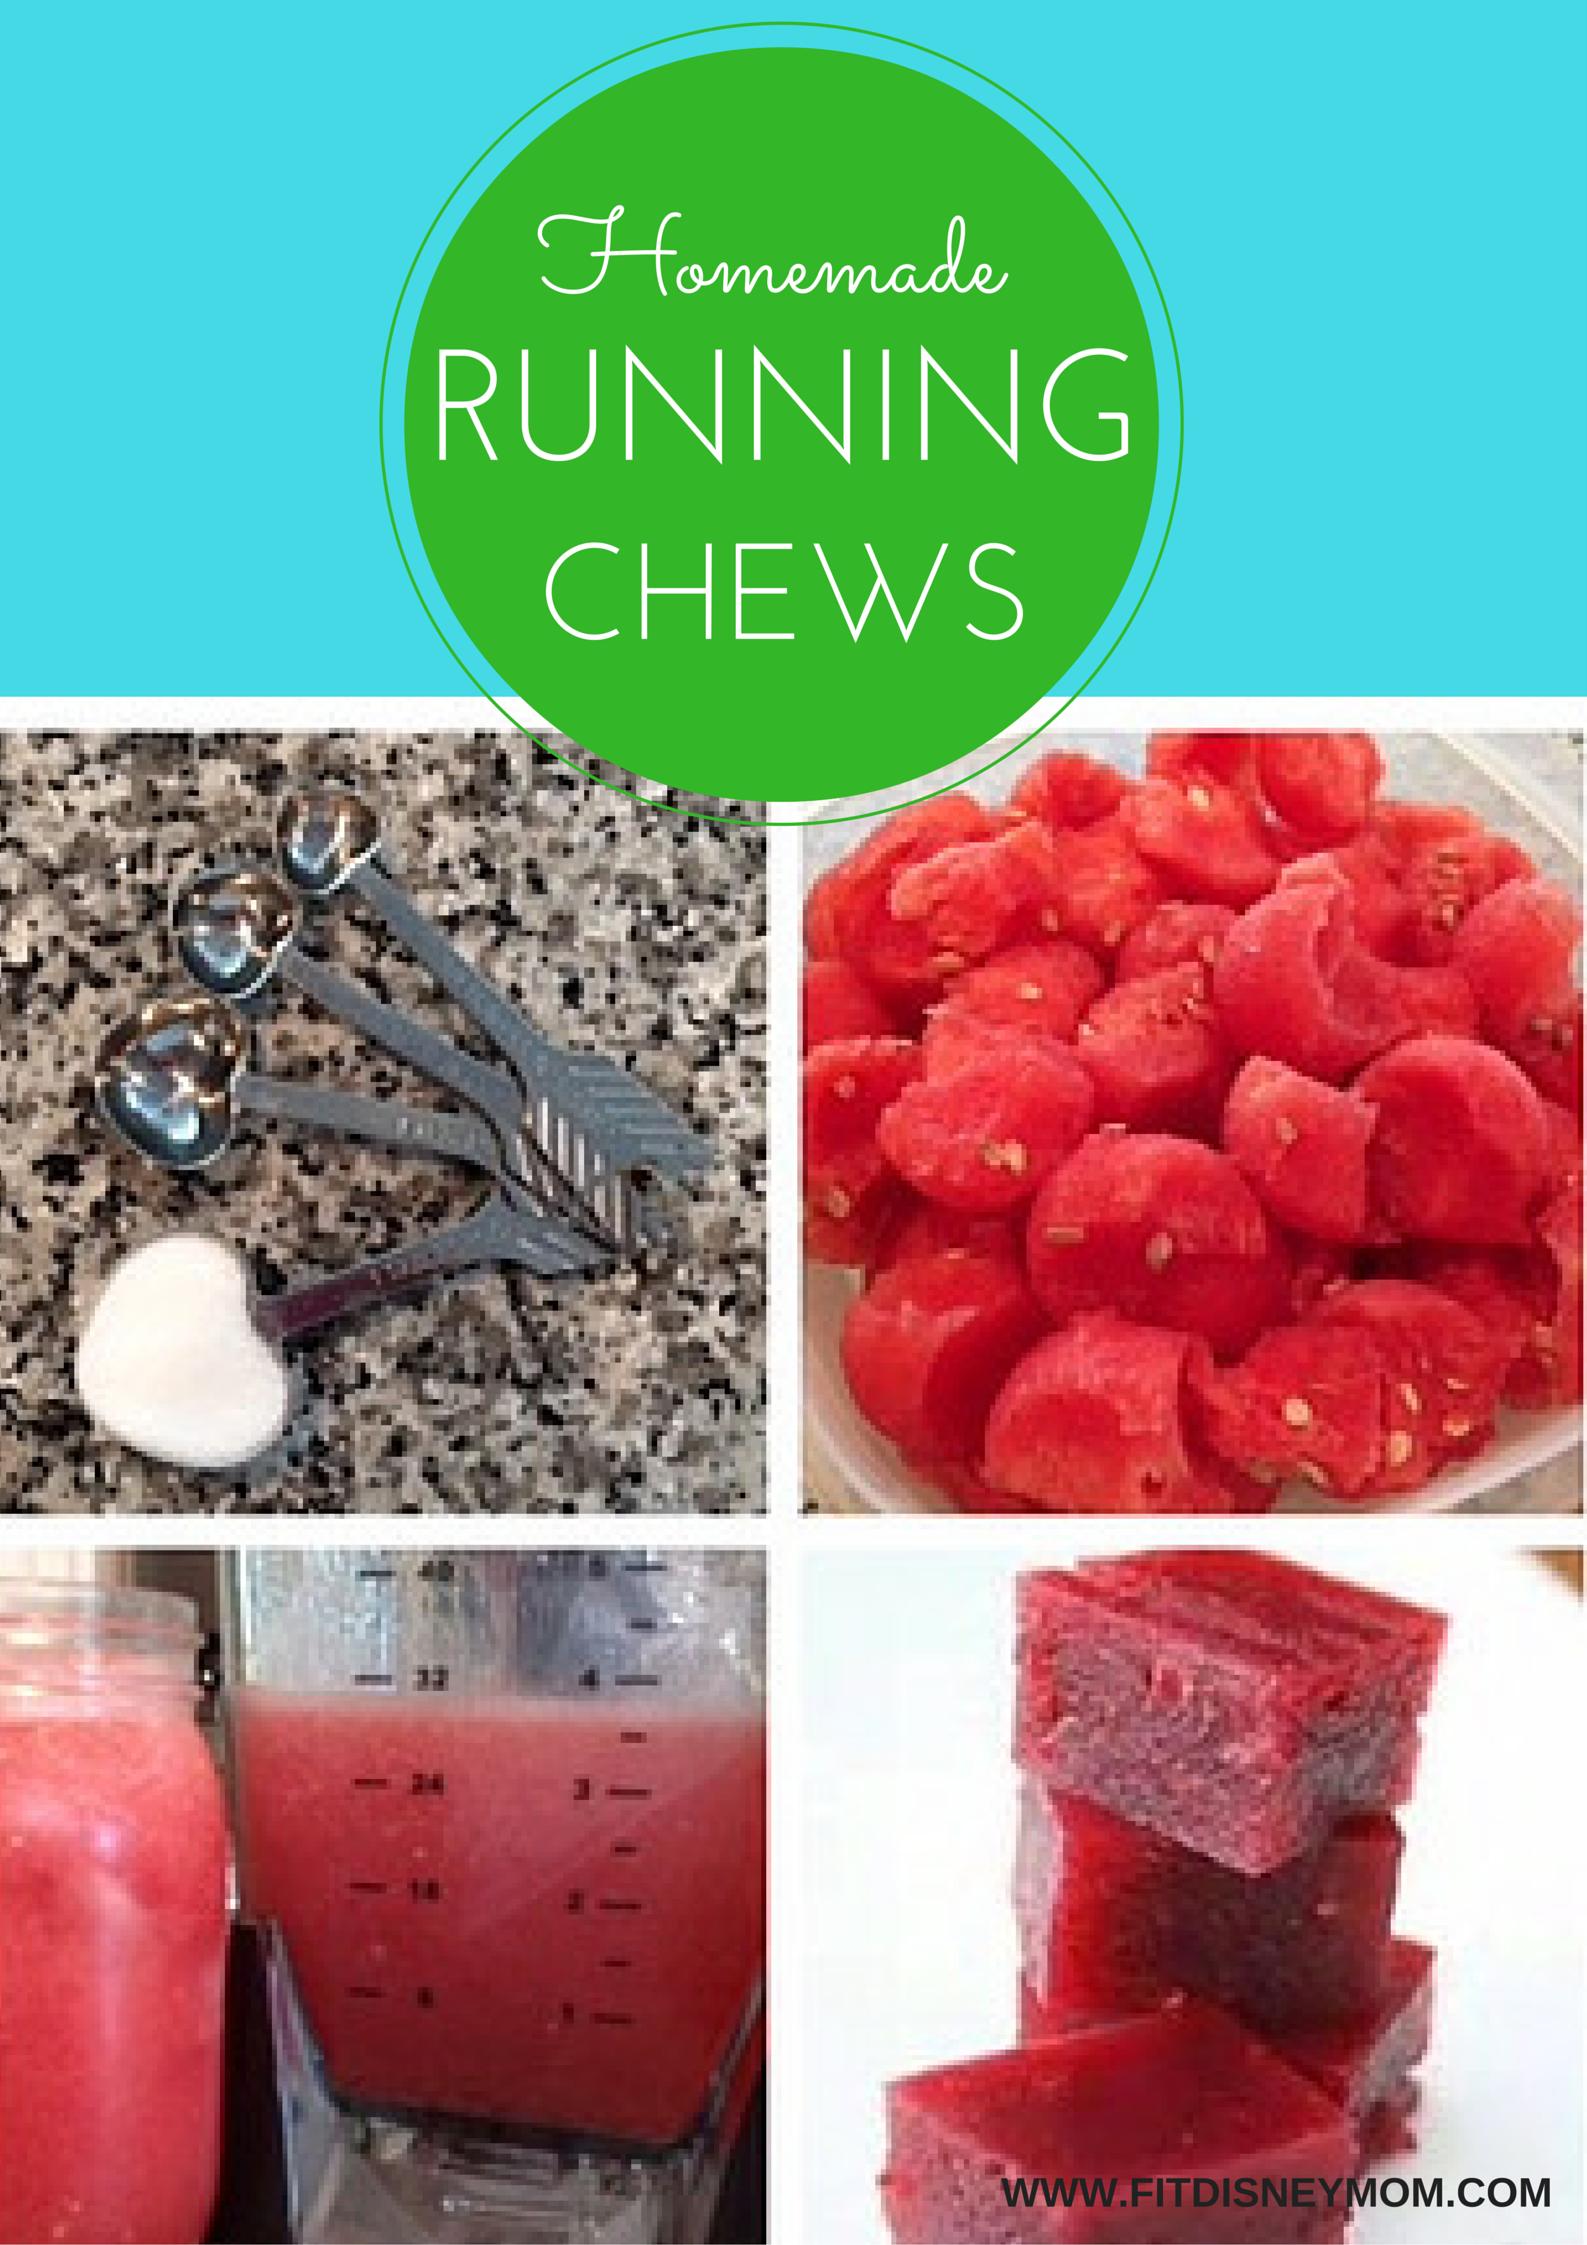 Homemade Watermelon Running Chews, Running Fuel, Homemade Running Fuel, Energy Chews, Running Fuel